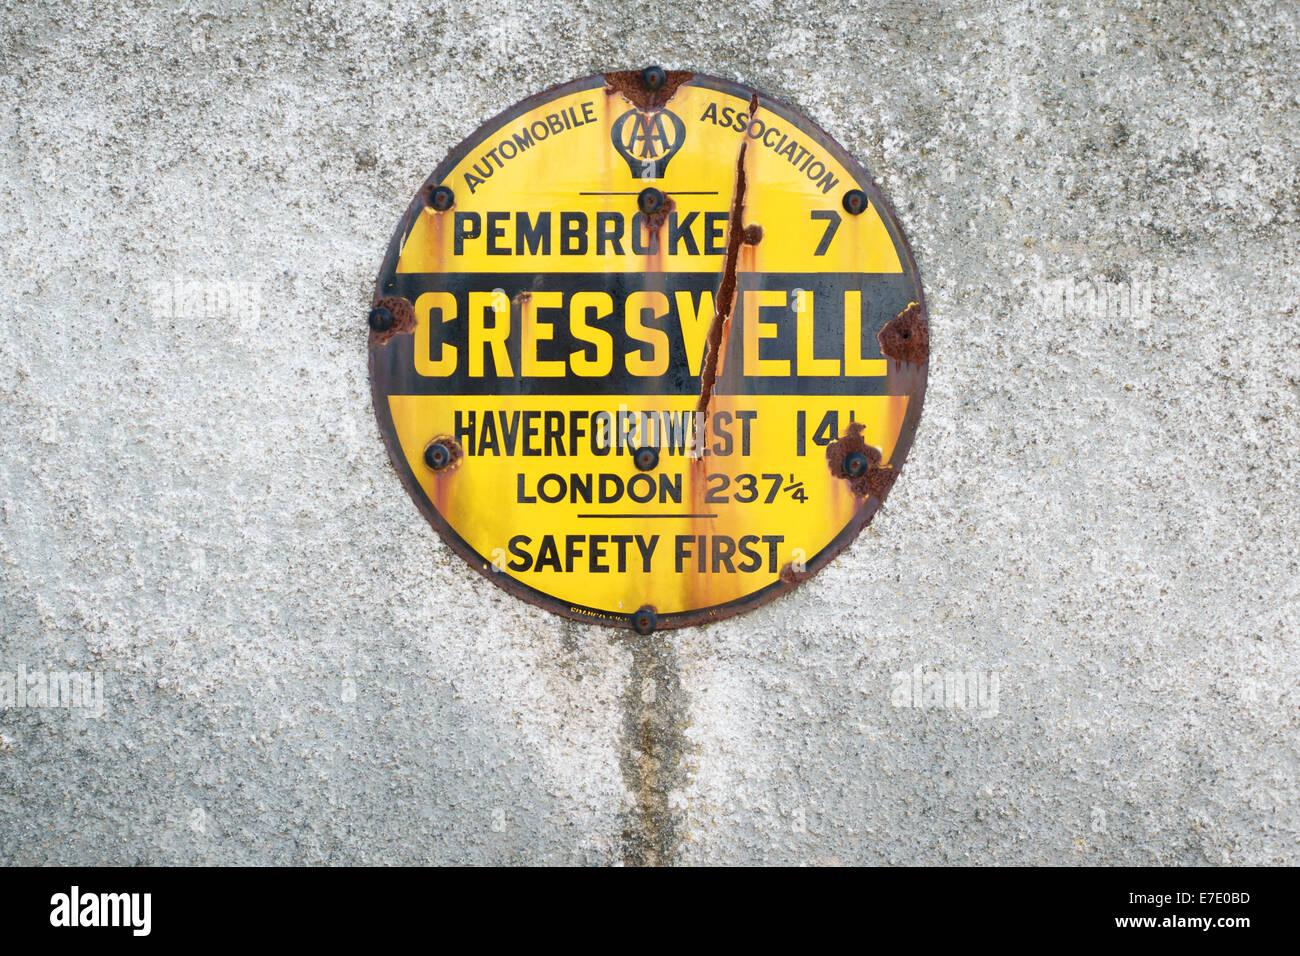 Eine alte AA (Automobile Association) gelbe Schild am Cresswell Quay, Pembrokeshire, Wales, UK. Stockbild